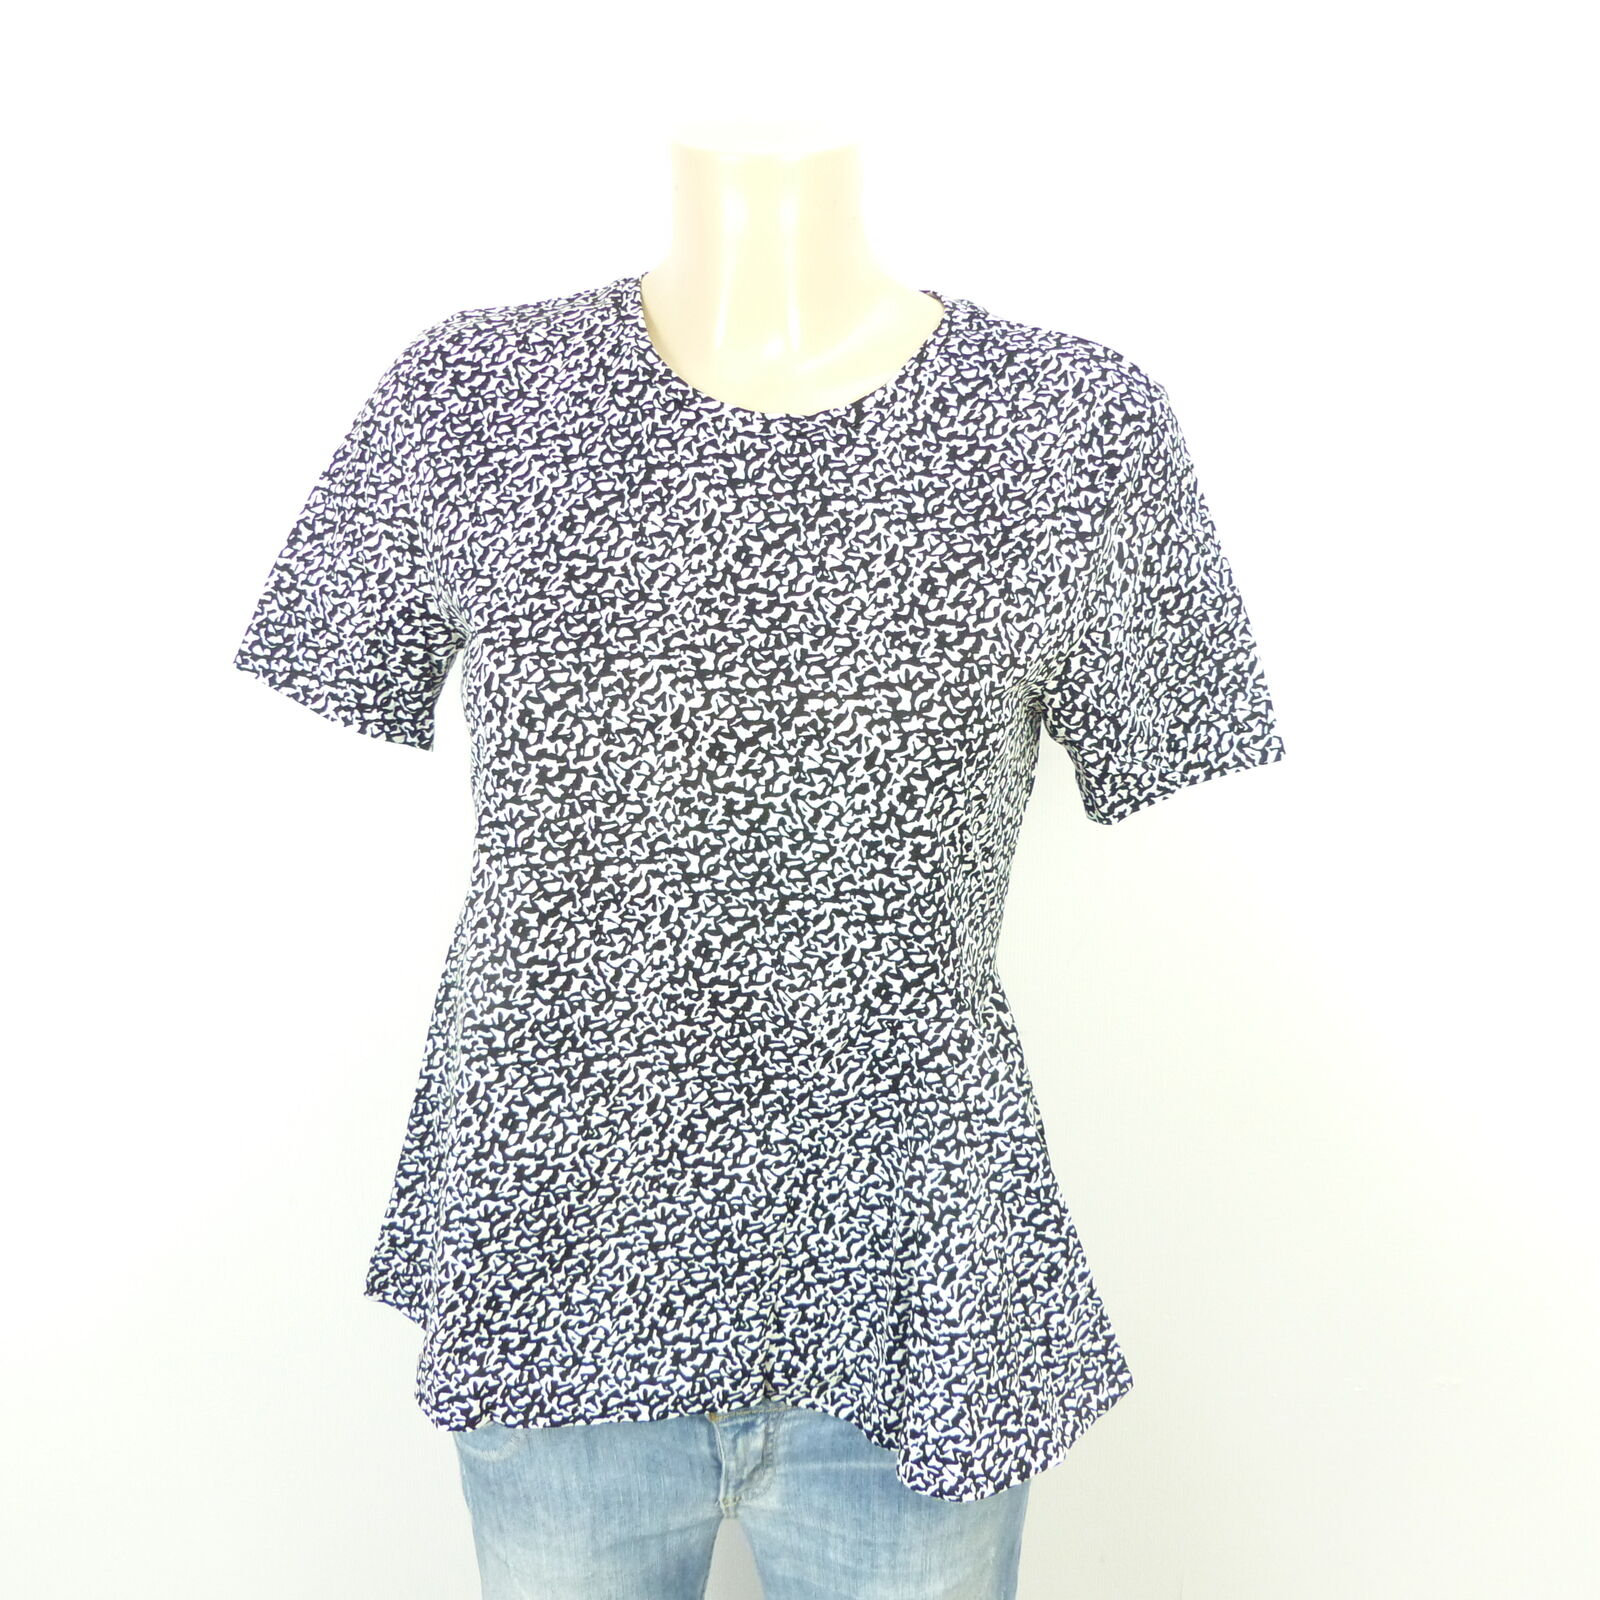 DGoldTHEE SCHUMACHER T-Shirt Schößchen Schwarz Weiß Kurzarm Gr. 1 DE 34 (AB303)